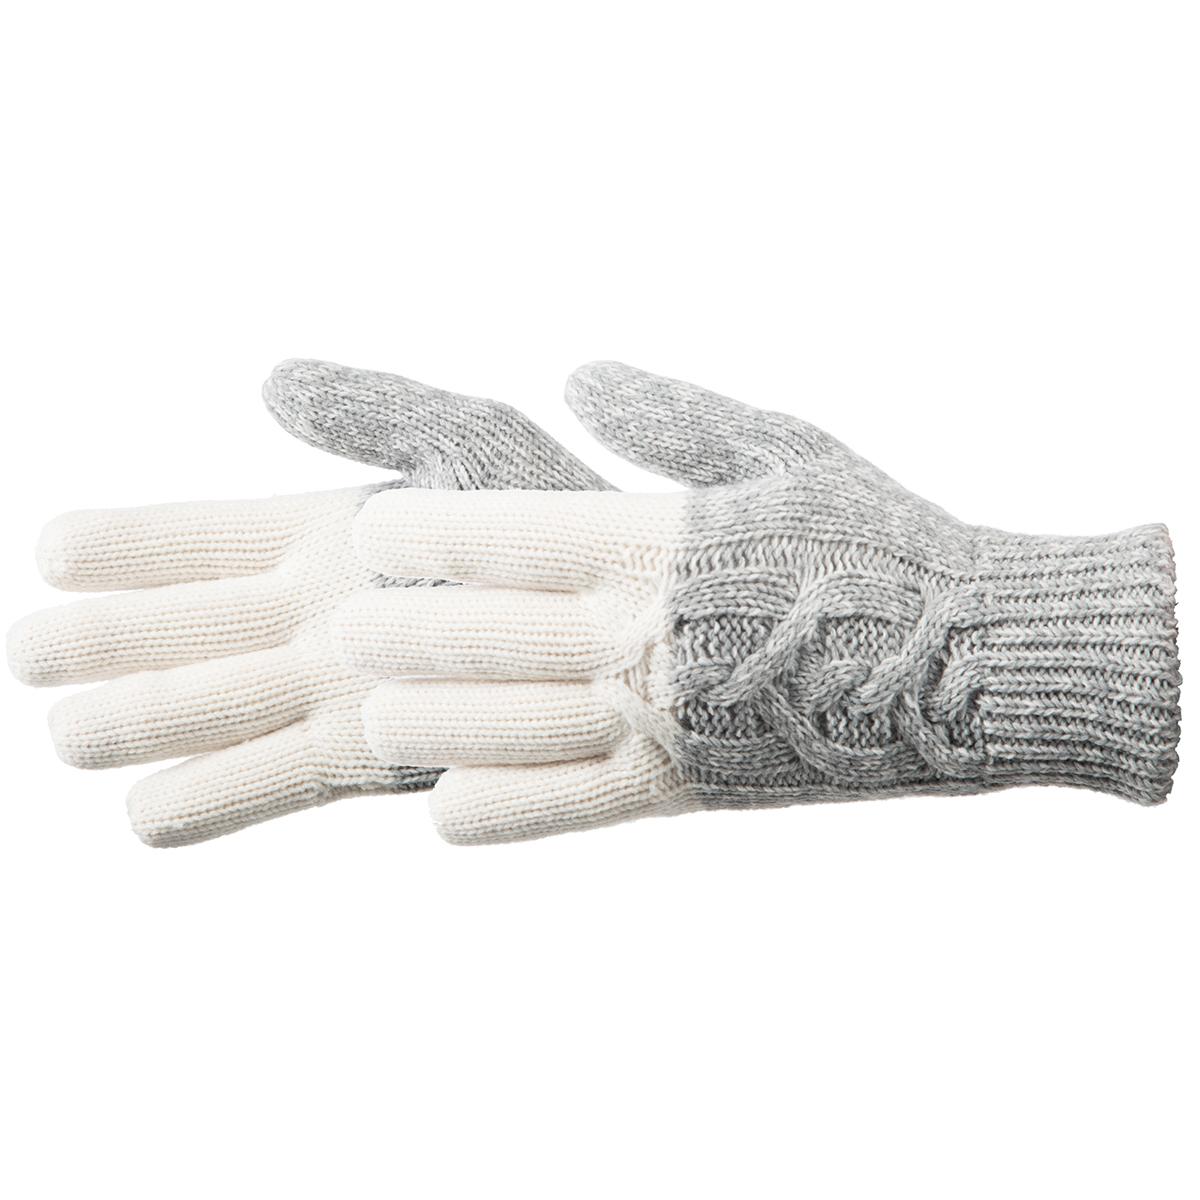 Manzella Women's Color Block Cable Knit Gloves